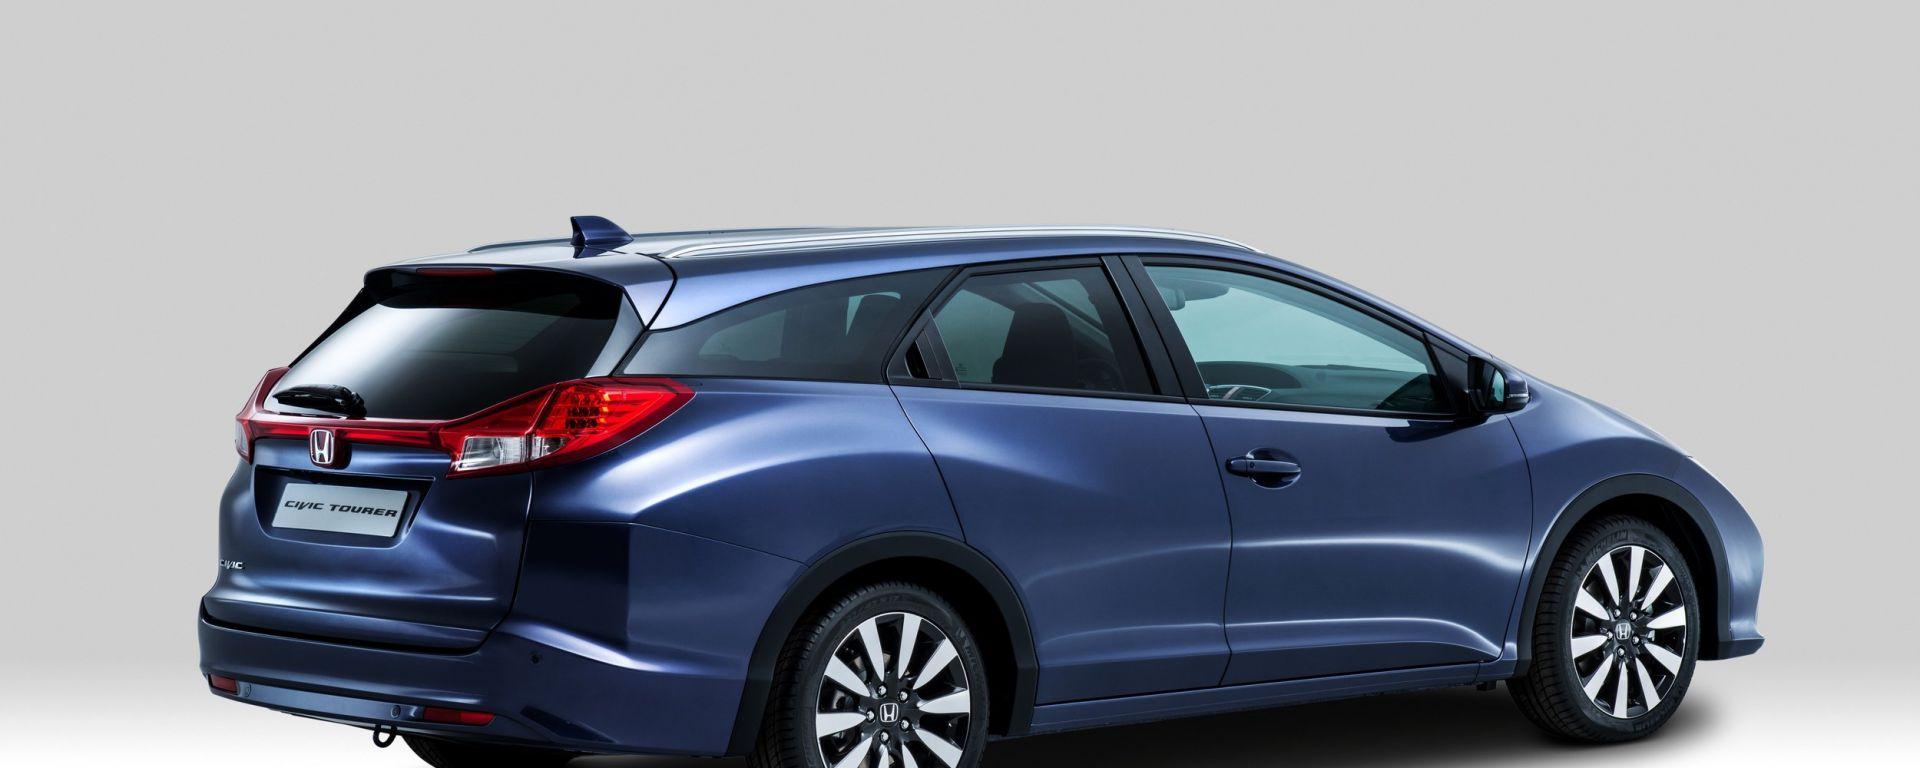 Honda Civic Tourer: le foto ufficiali